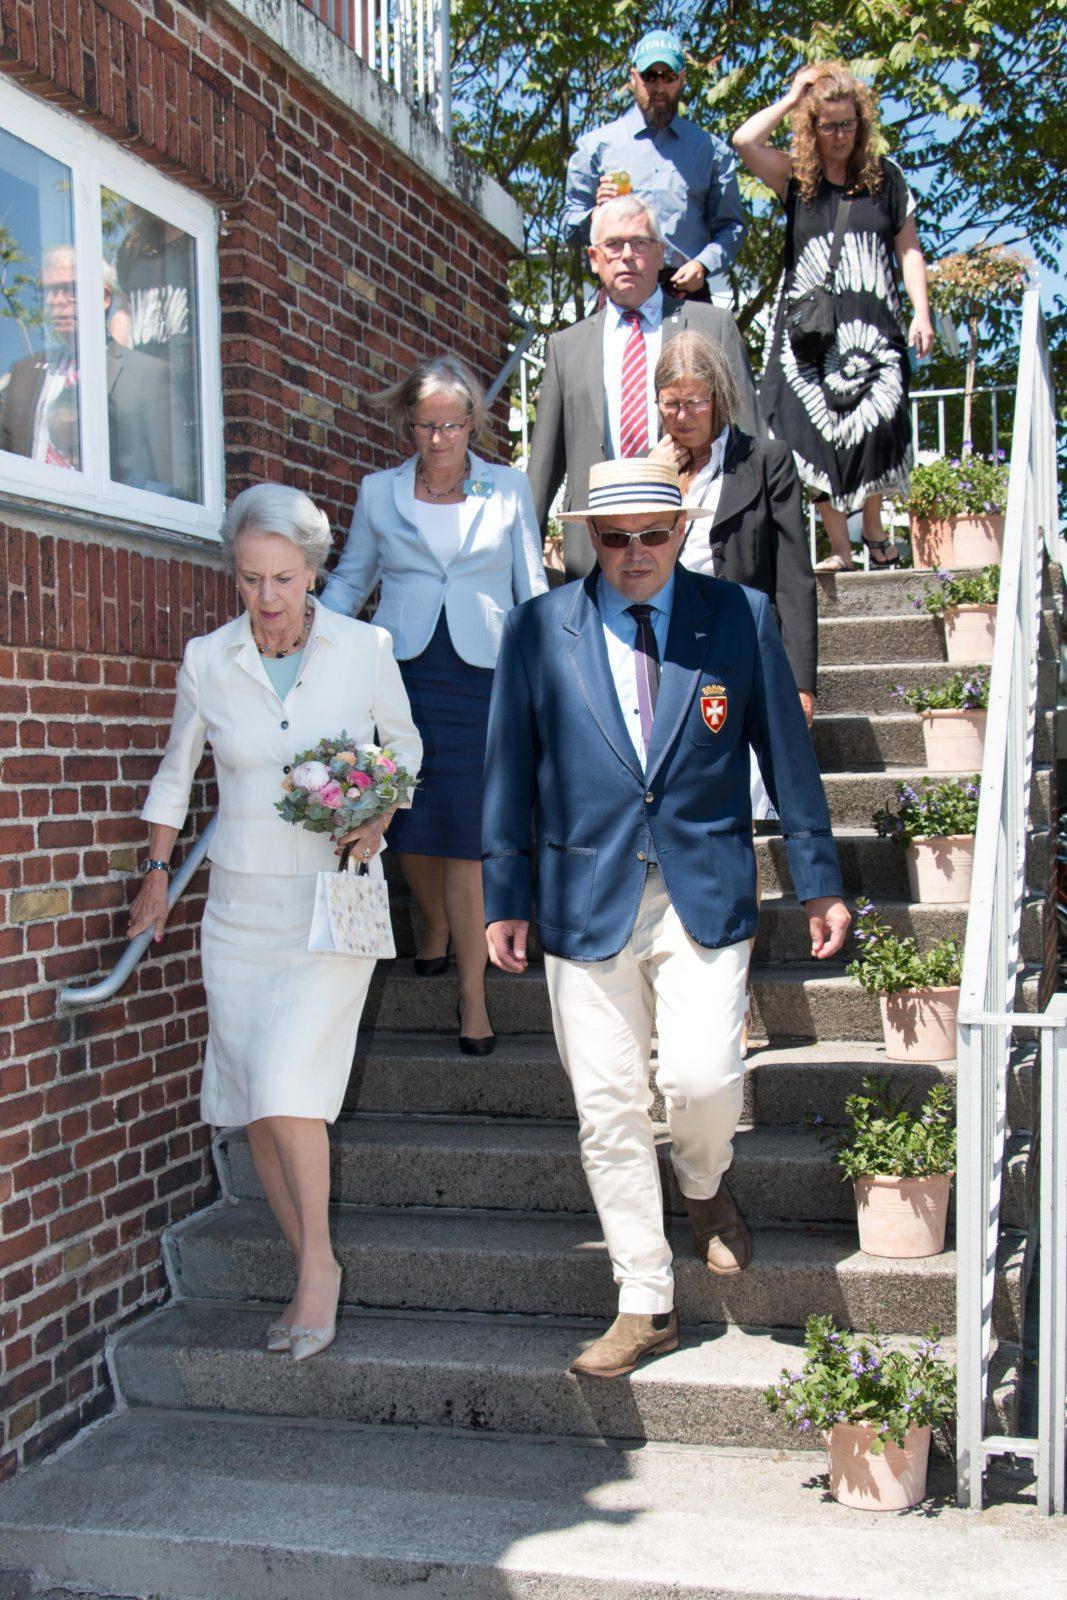 HKH Prinsesse Benedikte ankommer